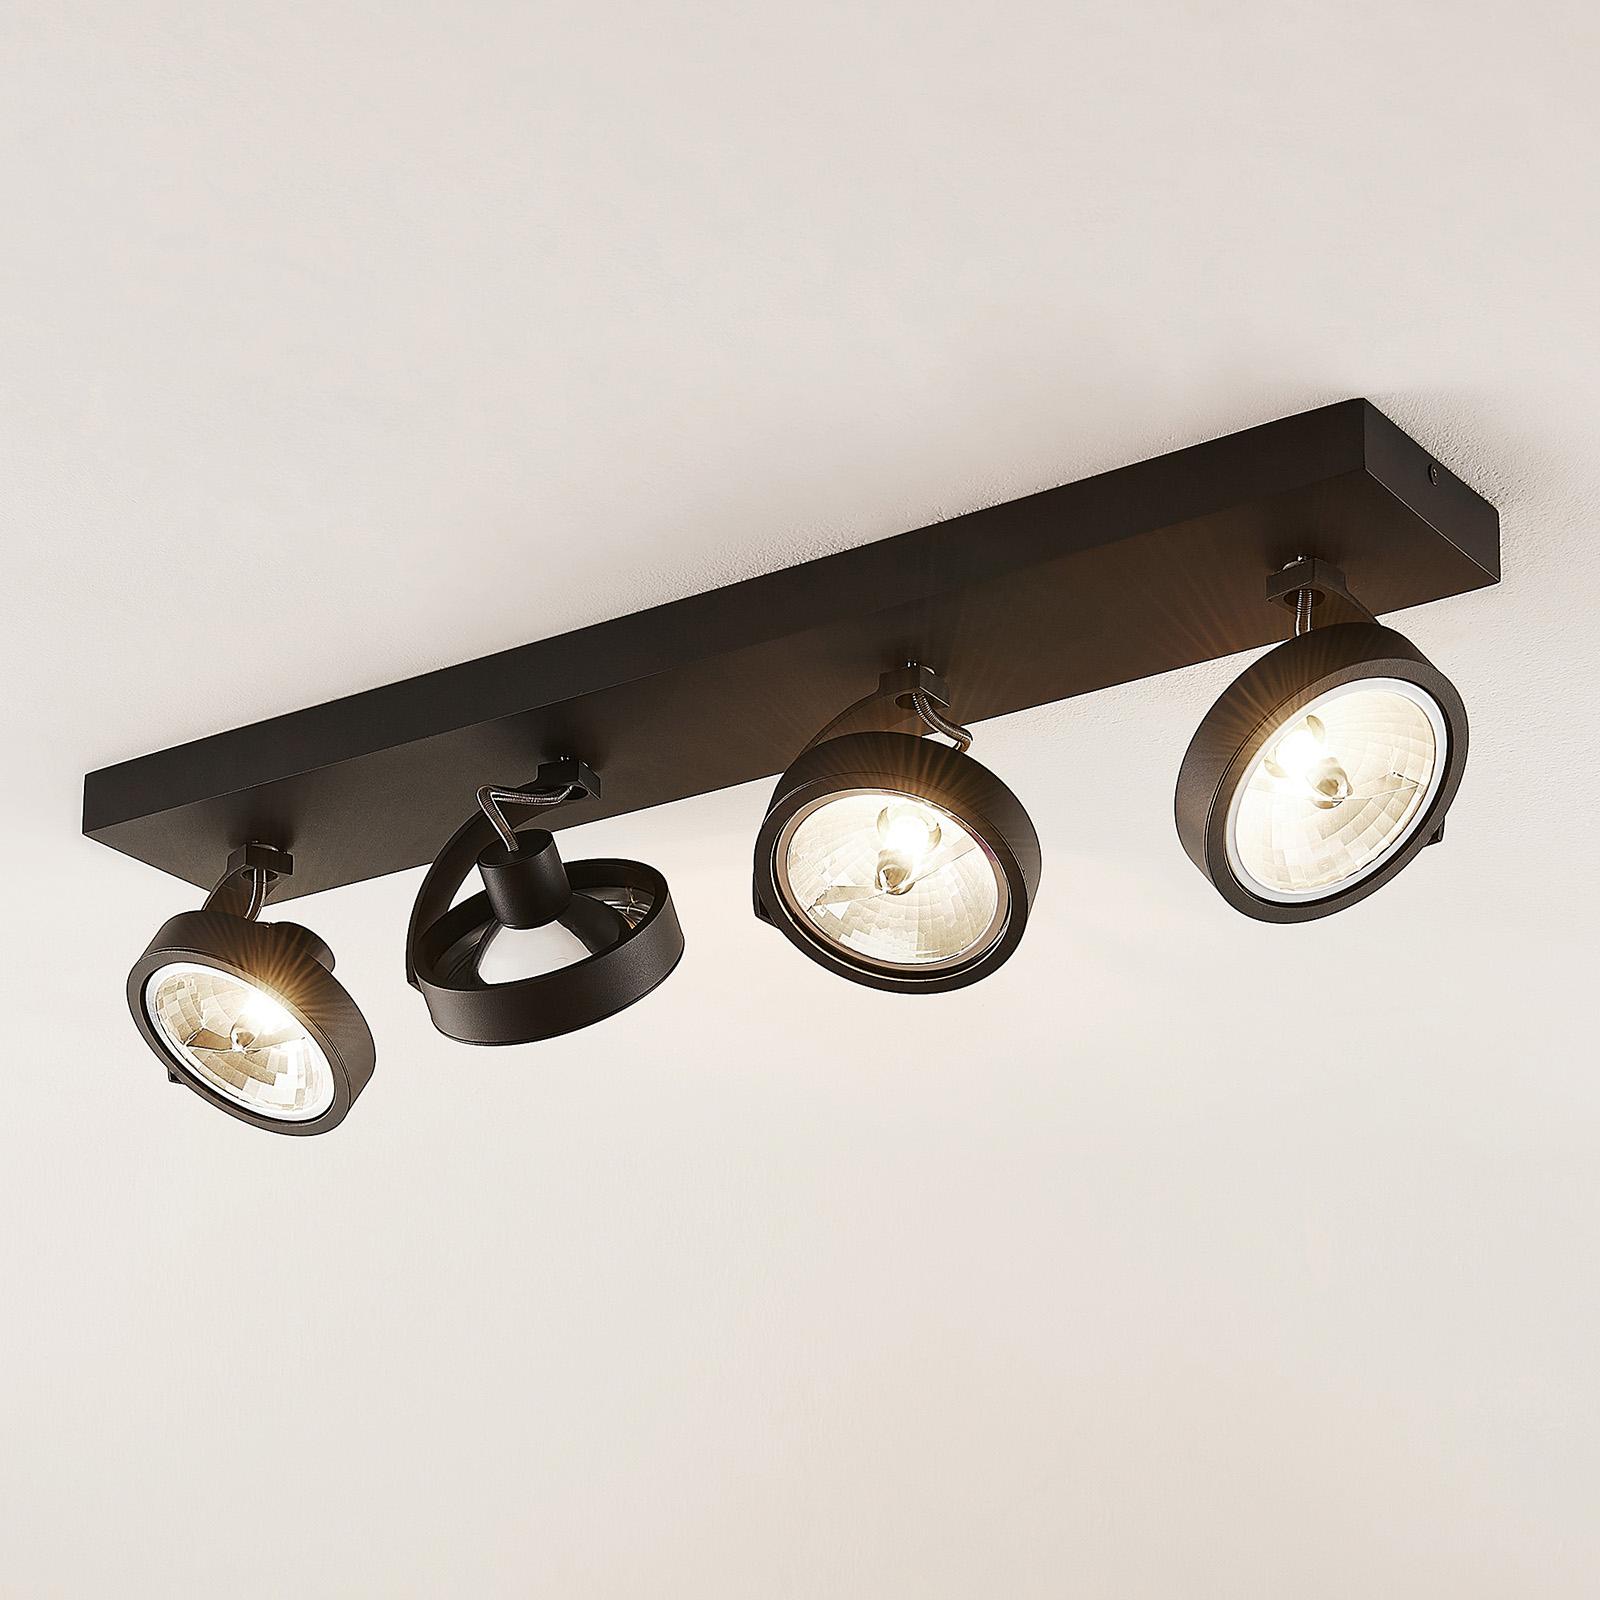 Arcchio Dagur plafondlamp 4-lamps, zwart